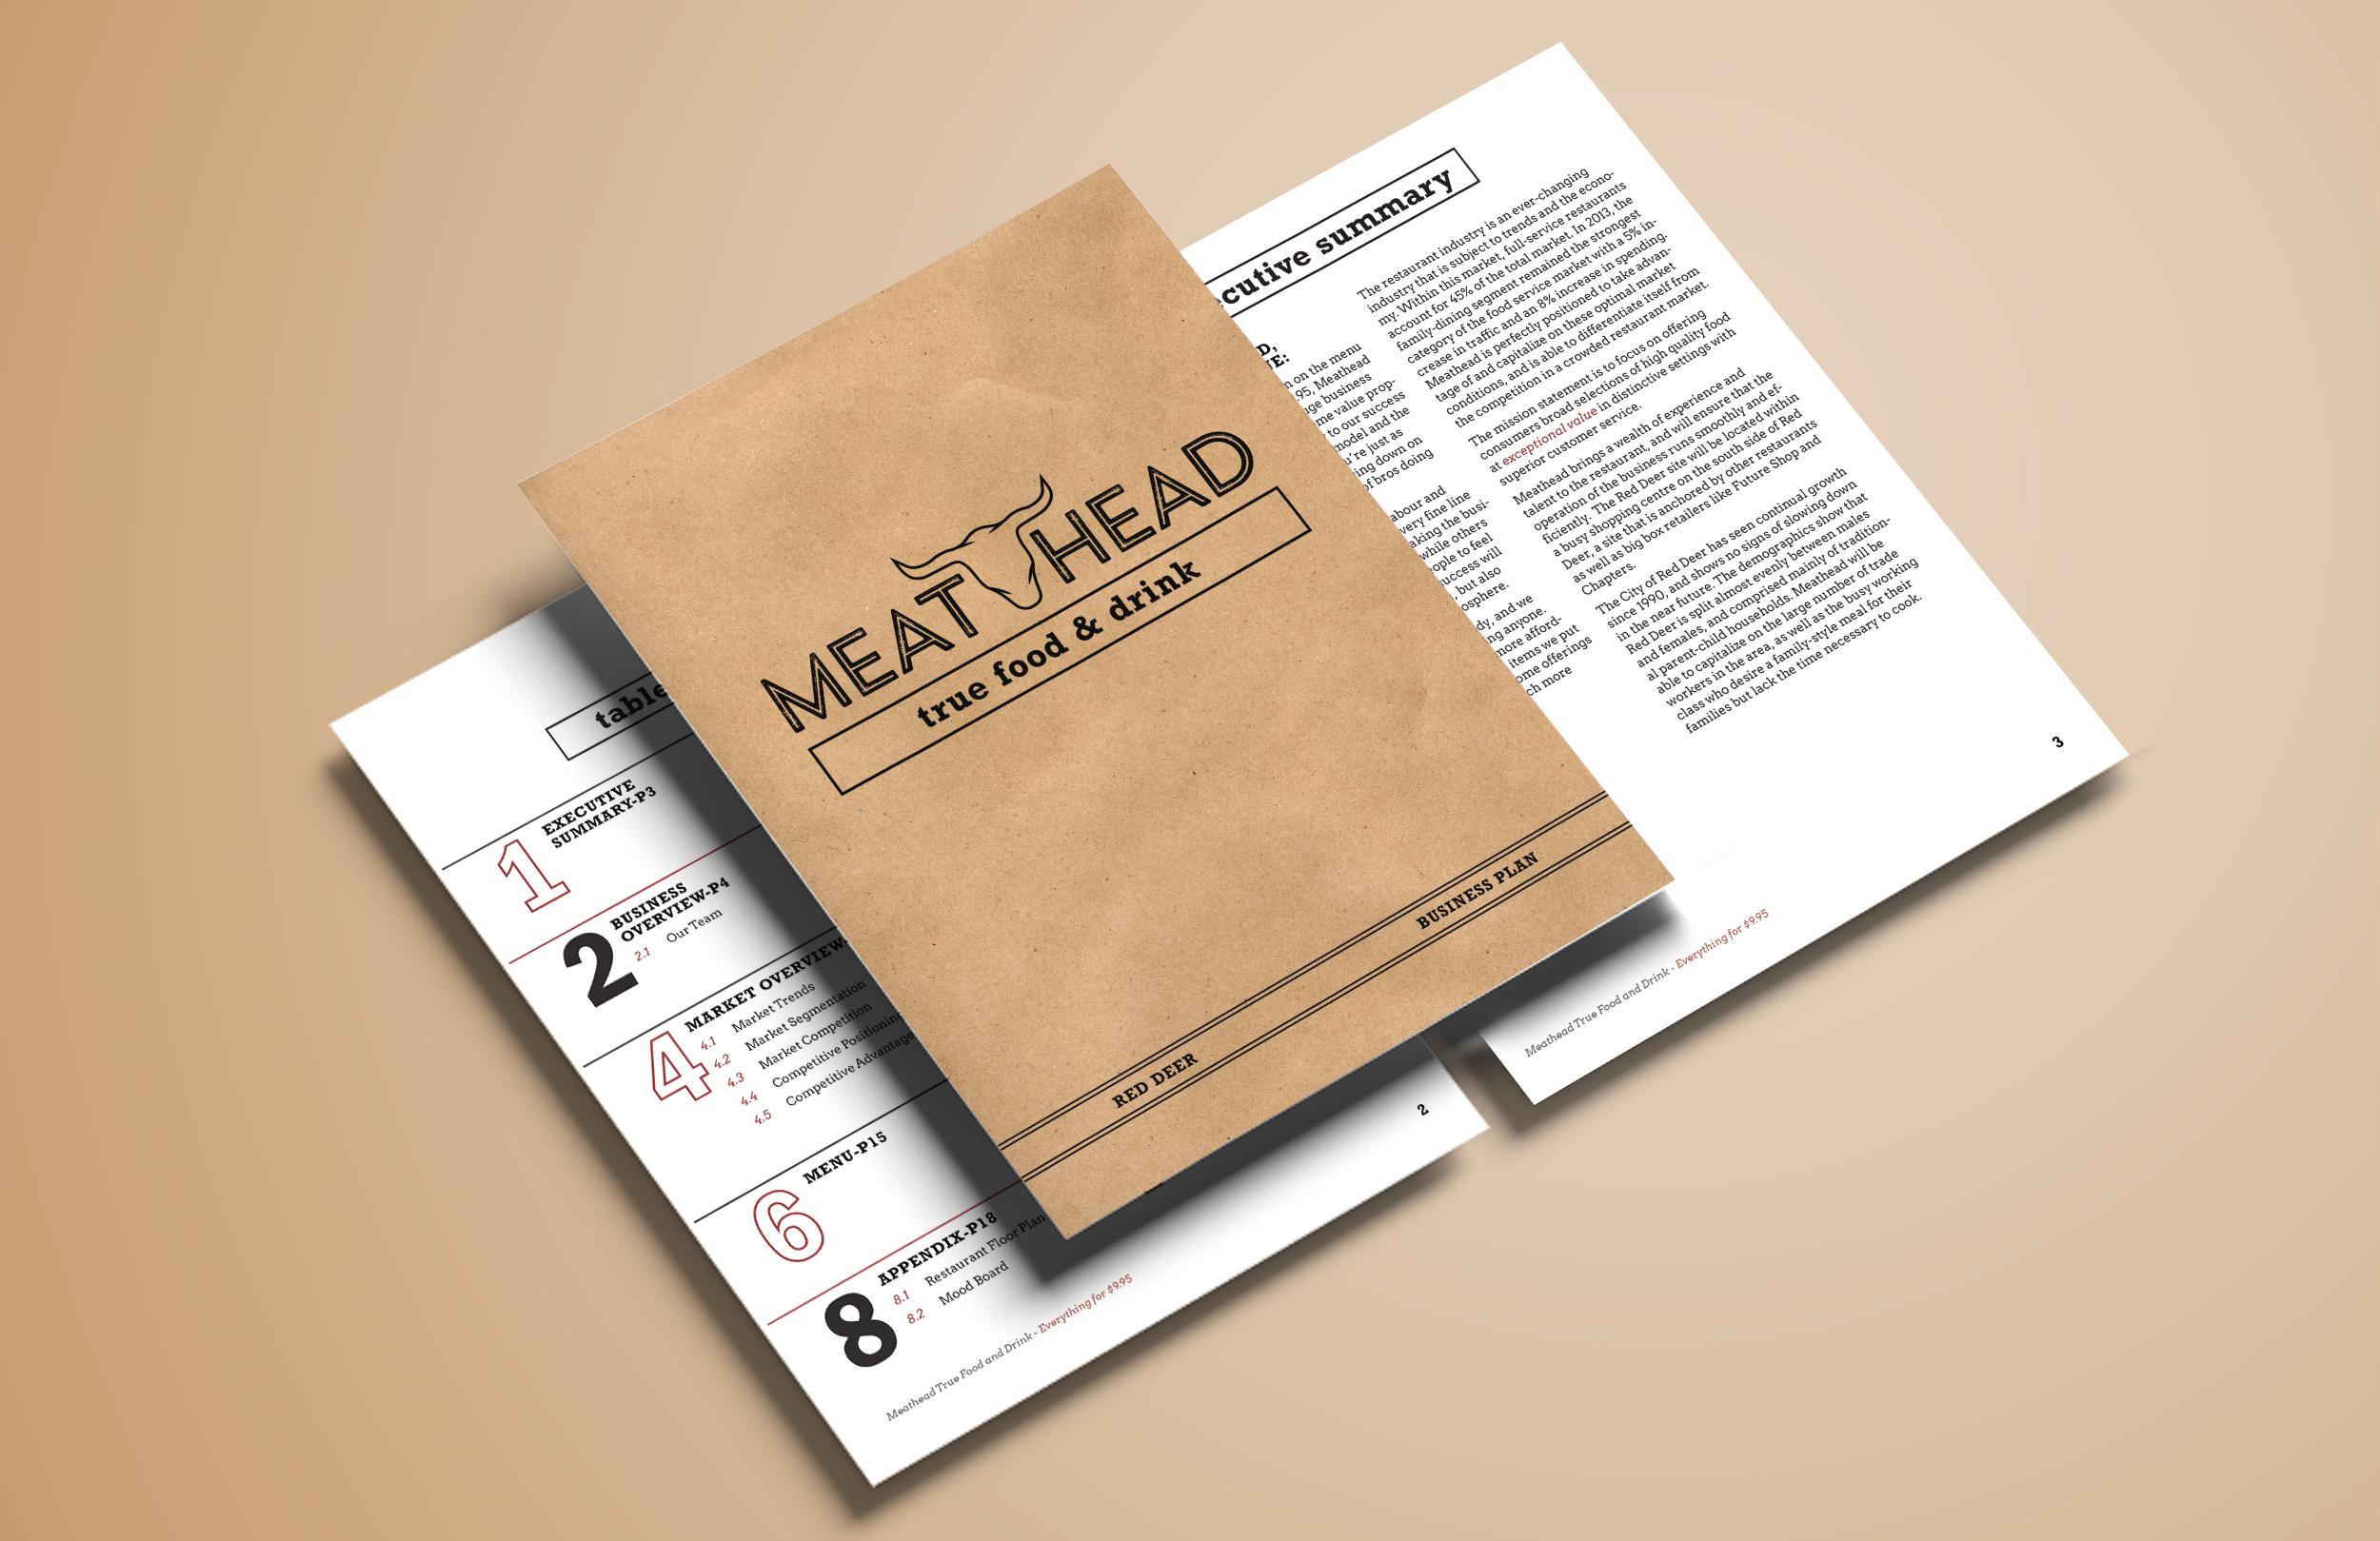 katelynbishop_design_meathead_businessplan1